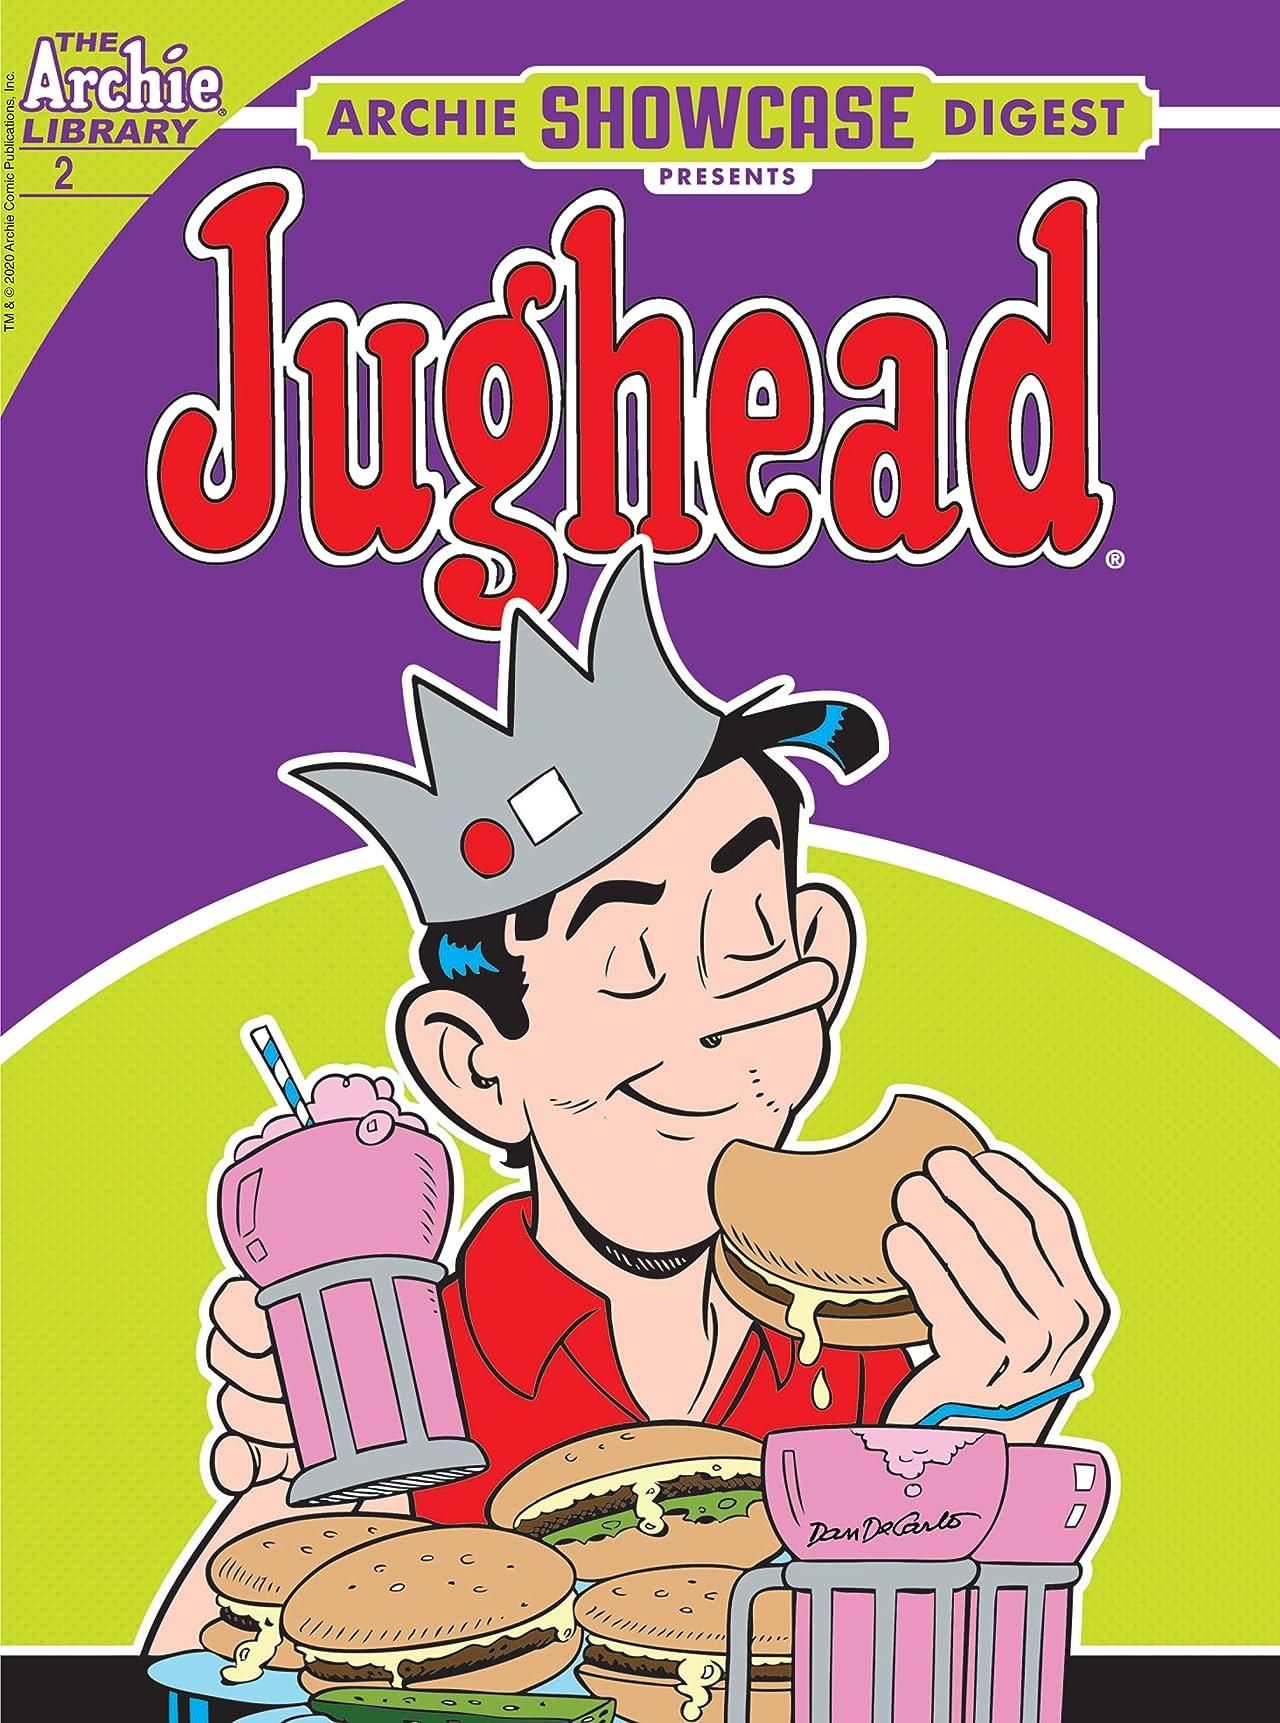 Archie Showcase Digest #2: Jughead